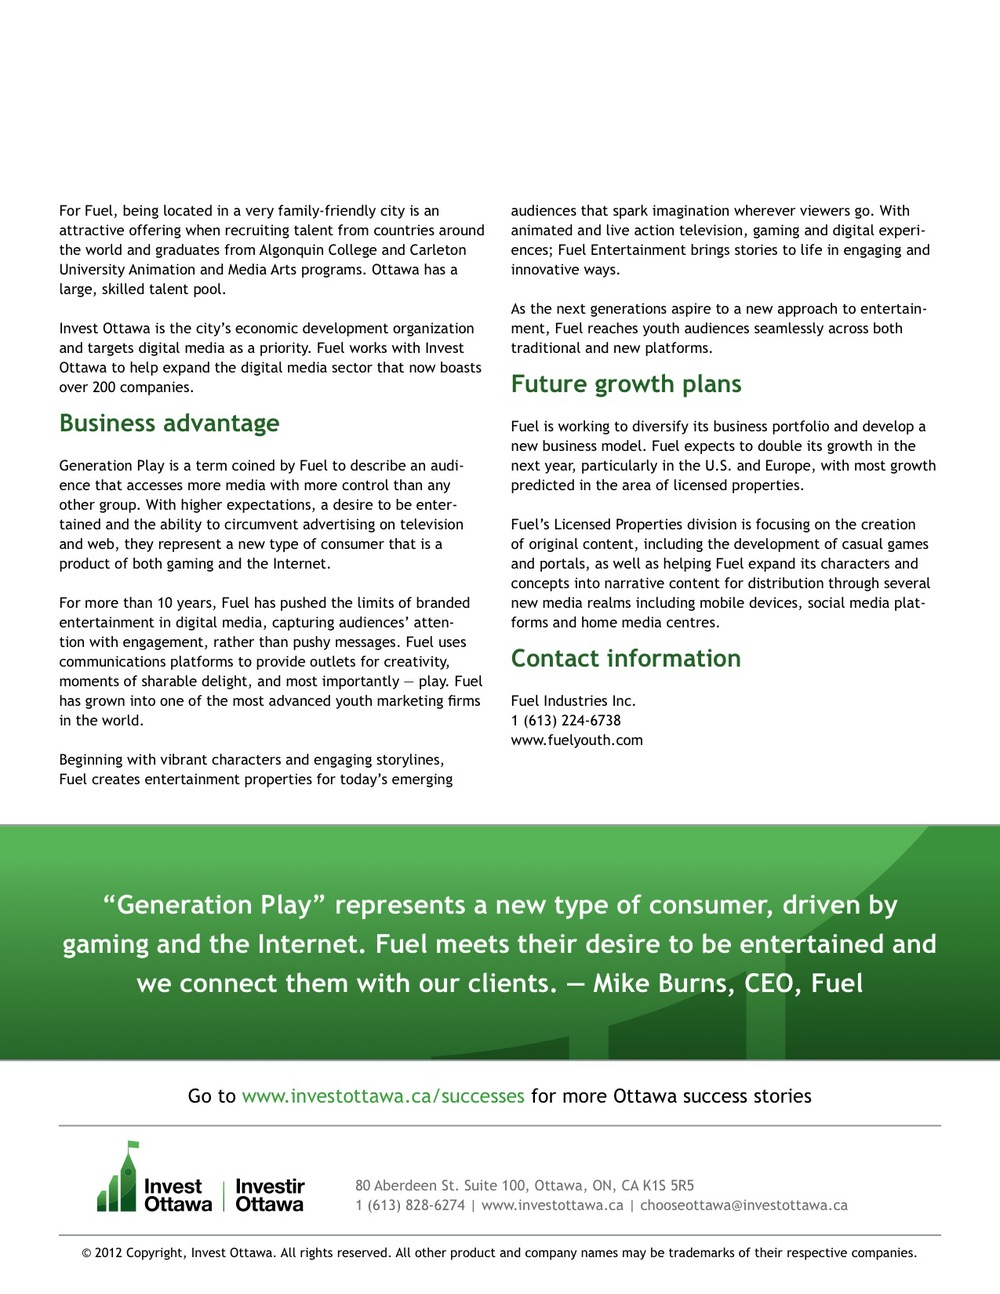 InvestOttawa-Fuel-VIEW-page2.jpg